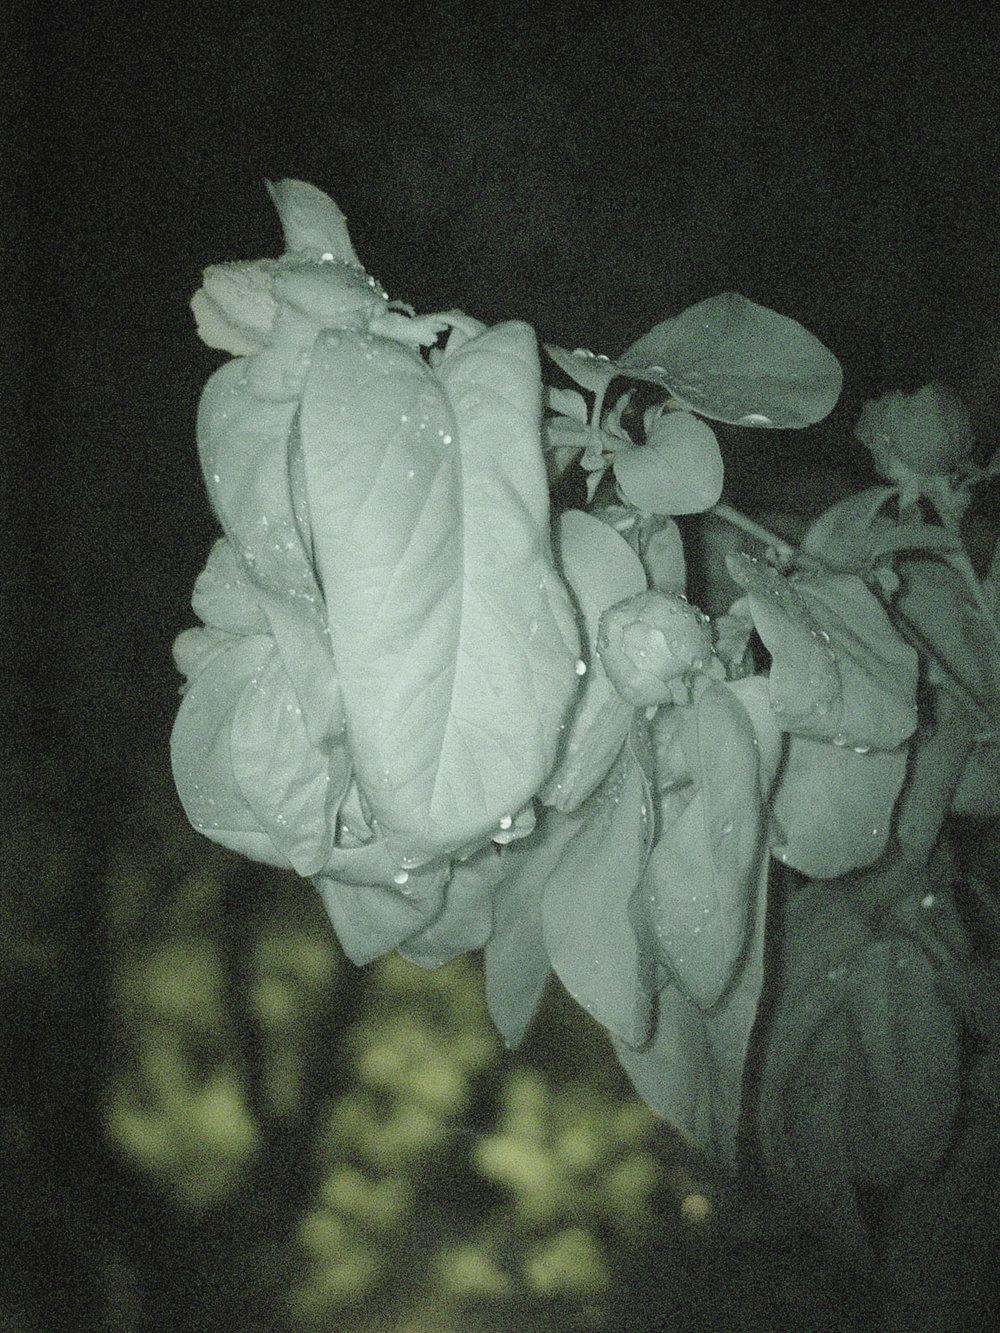 widmertheodoridis_Simone Kappeler_Der Garten nachts XX, 25.4.2014, 42,5x32cm.jpg